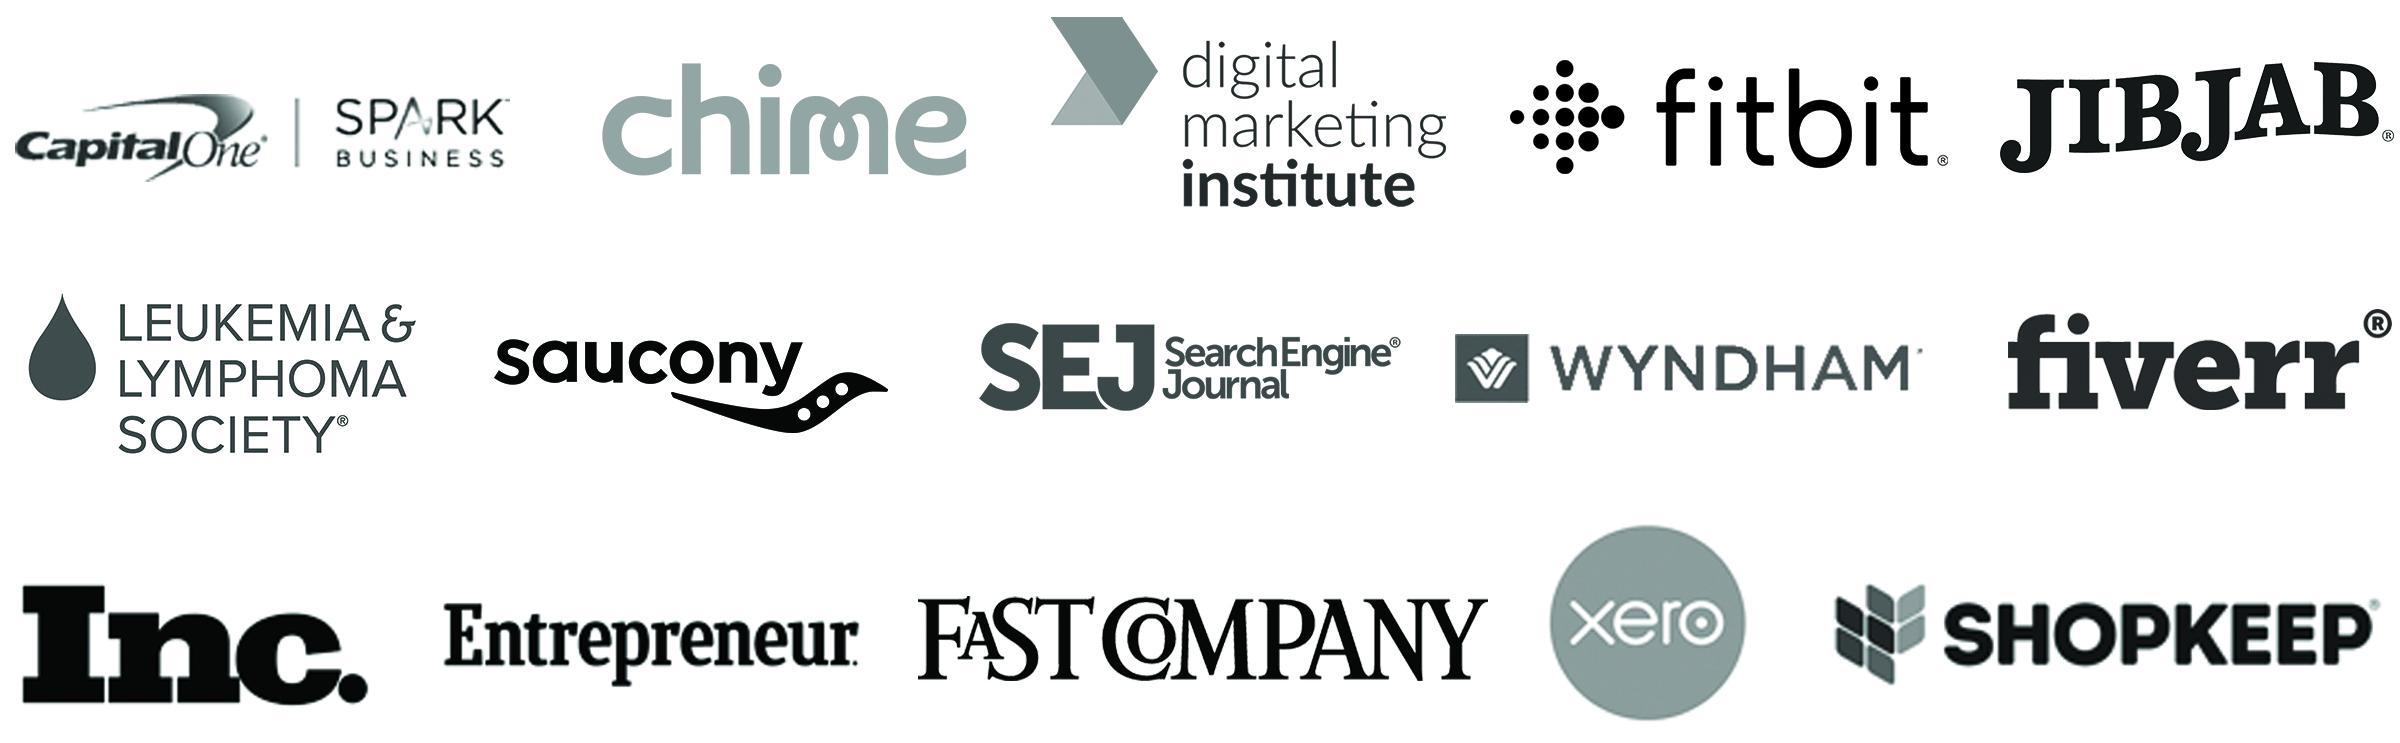 Home Page Brand Logos 2.jpg